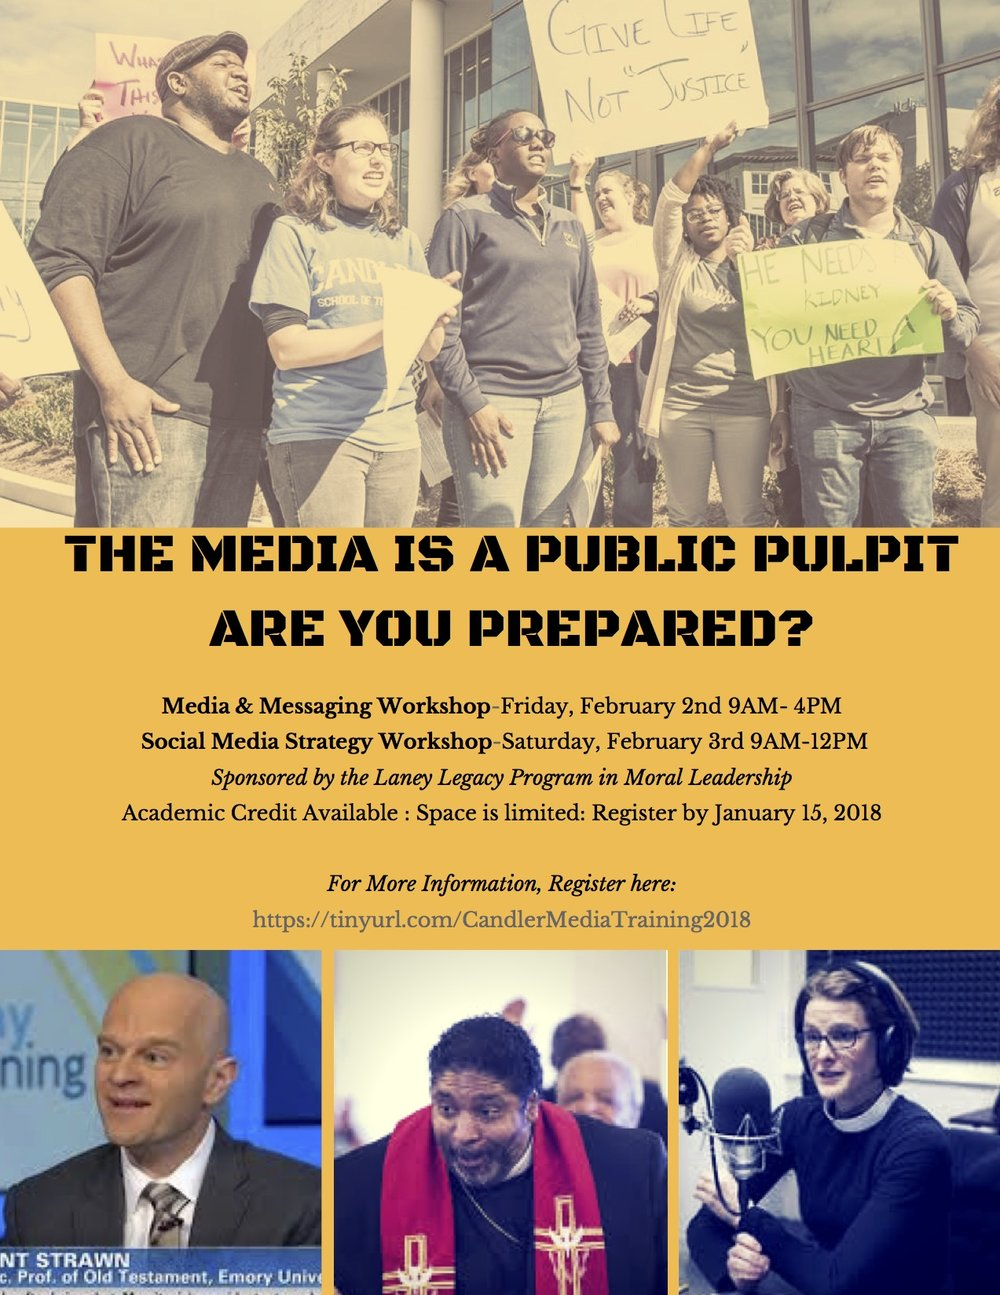 We Need You-Media Training 2018.jpg